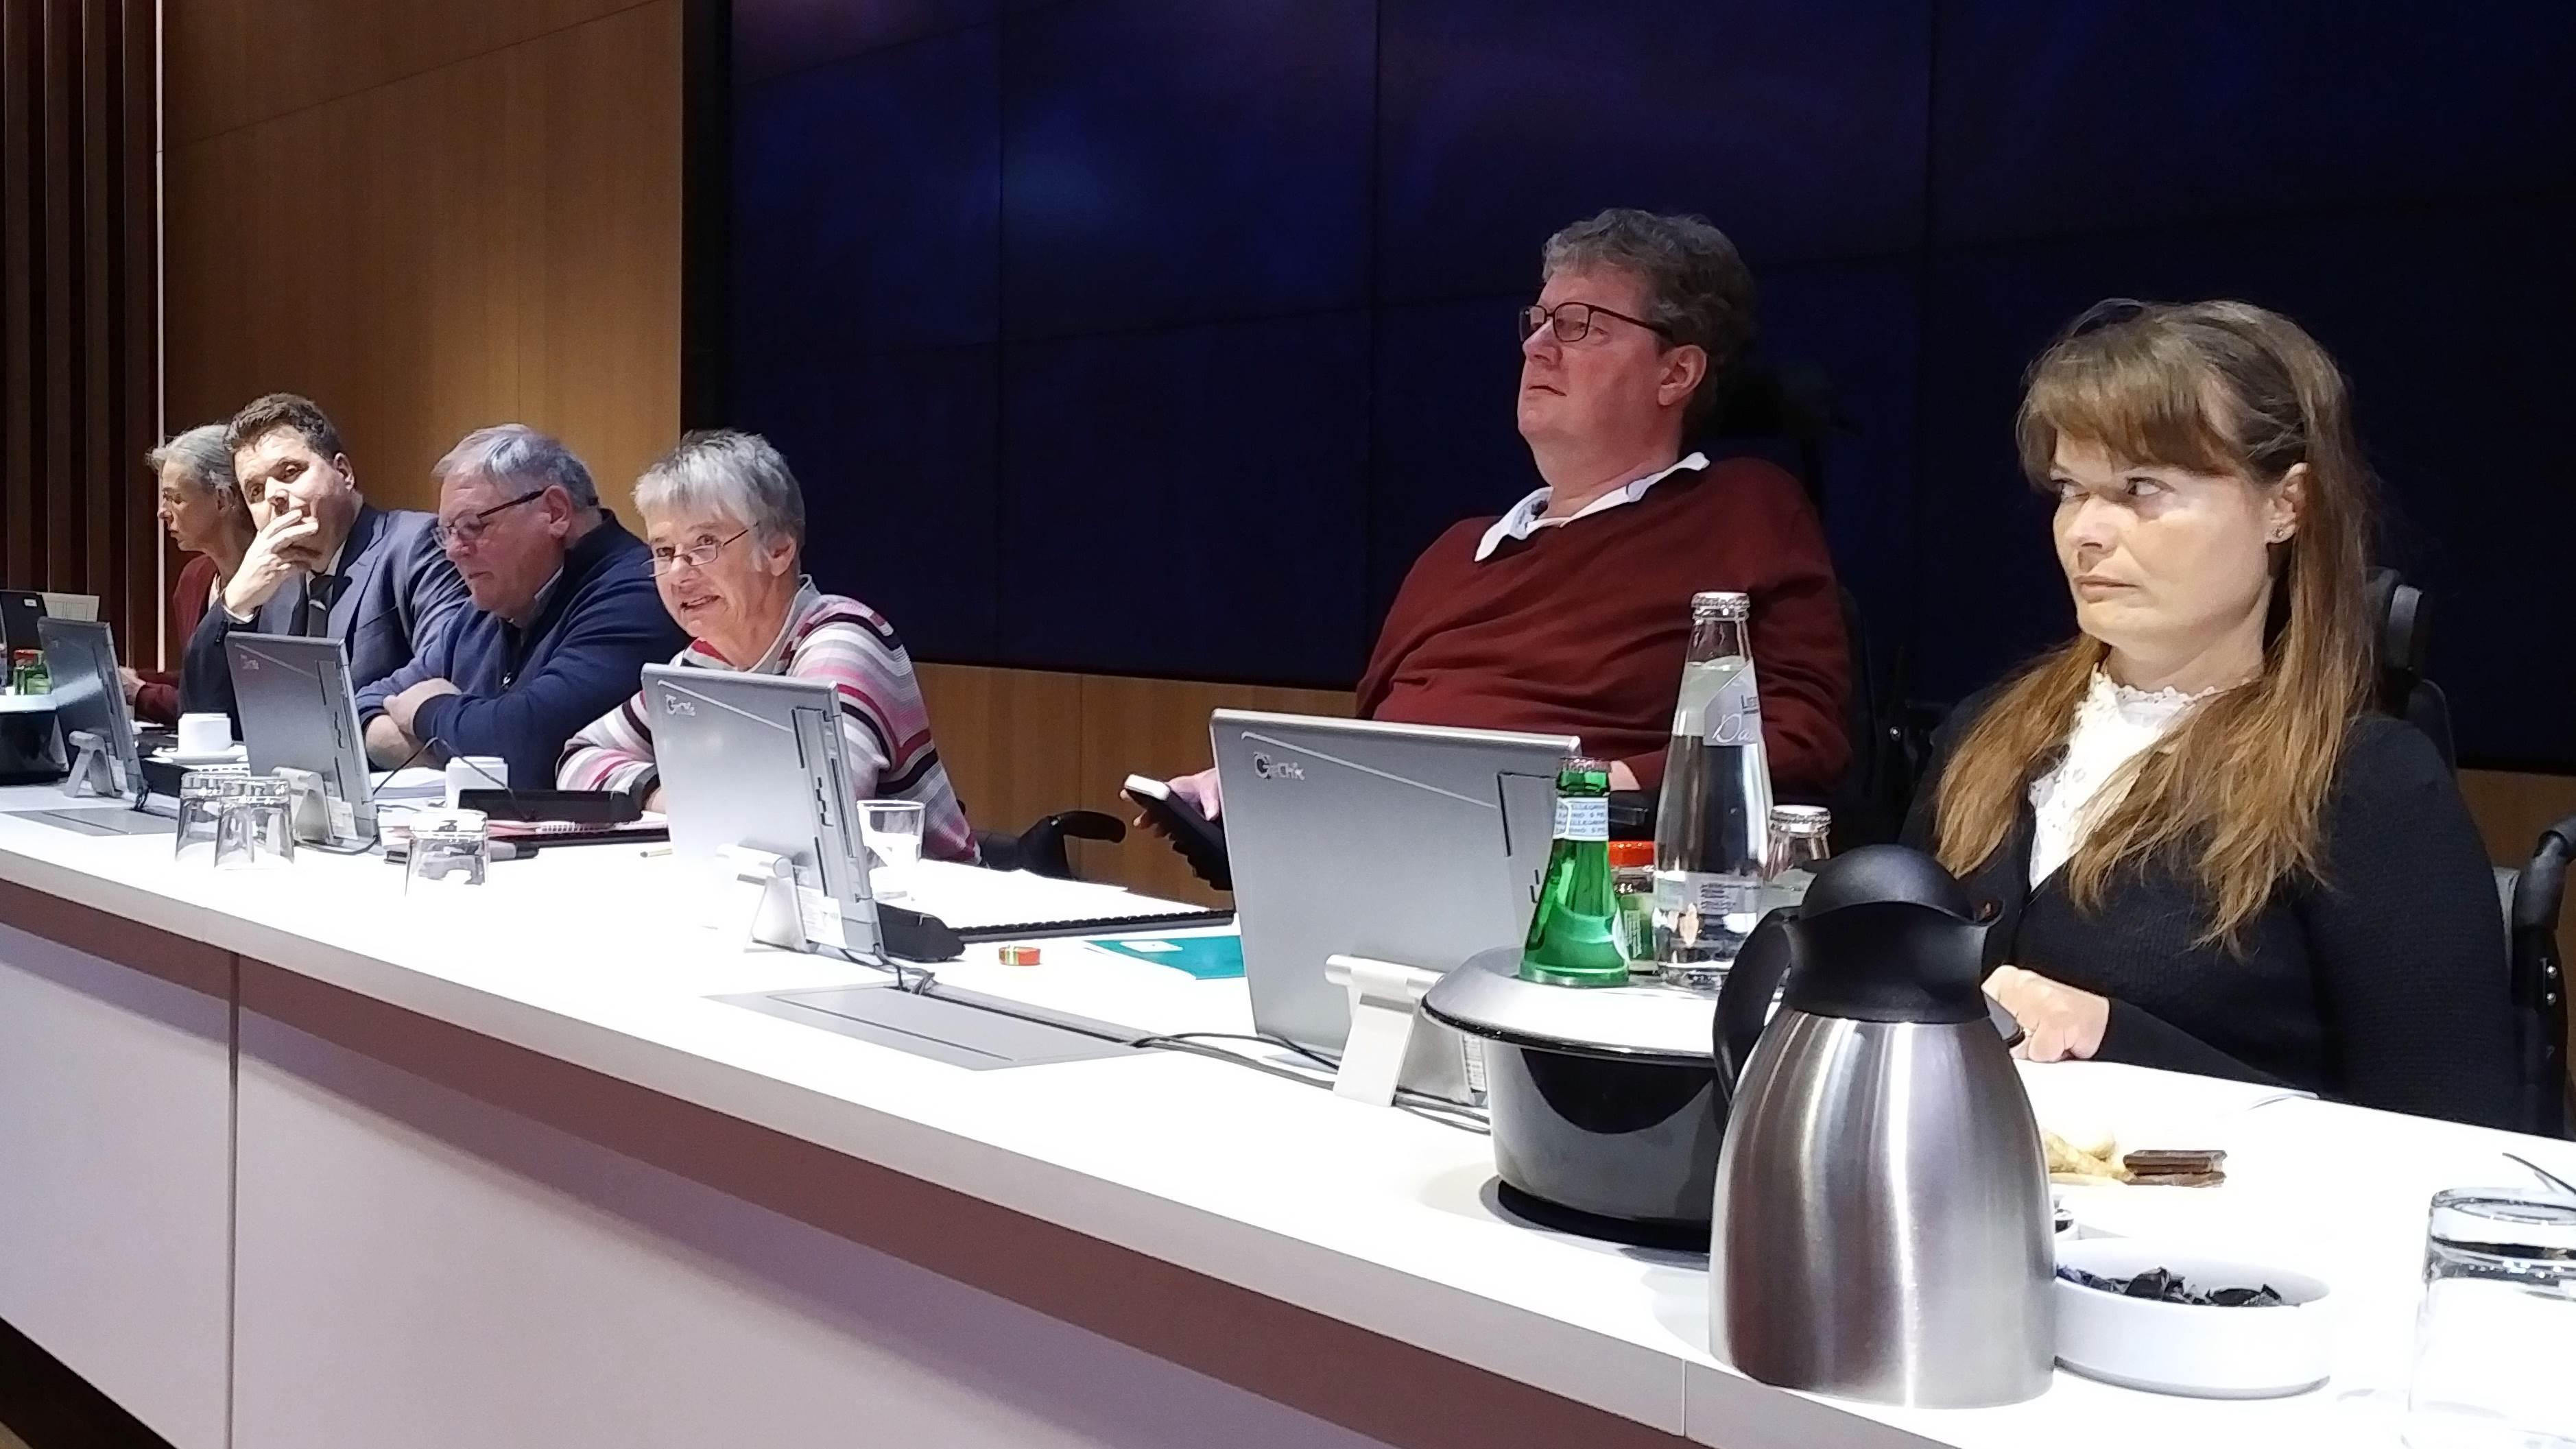 FbJJ auf dem Podium v.l.n.r. Jürgen Dusel (Gast) , Horst Frehe, Sigi Arnade (Moderation), Carl-Wilhelm Rößler, Nancy Poser (c) ISL e.V.